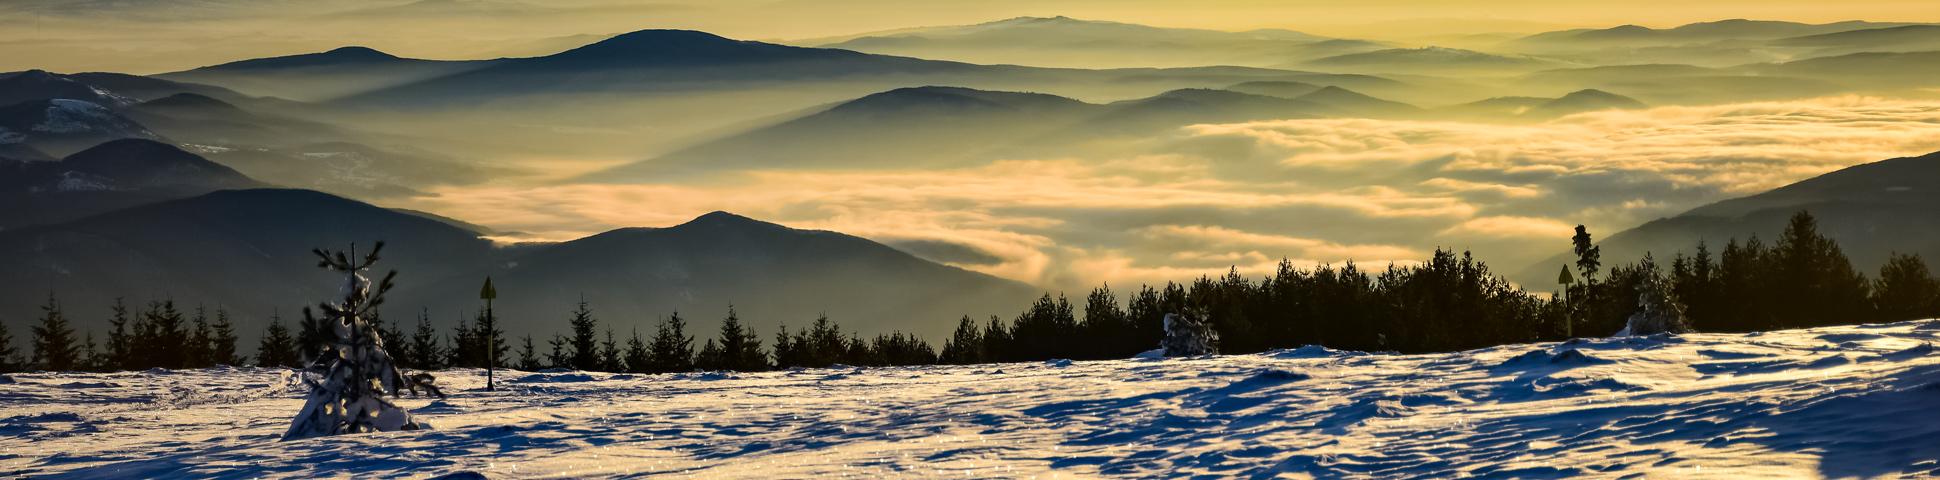 Panoramic view from Ski Touring in Bulgaria